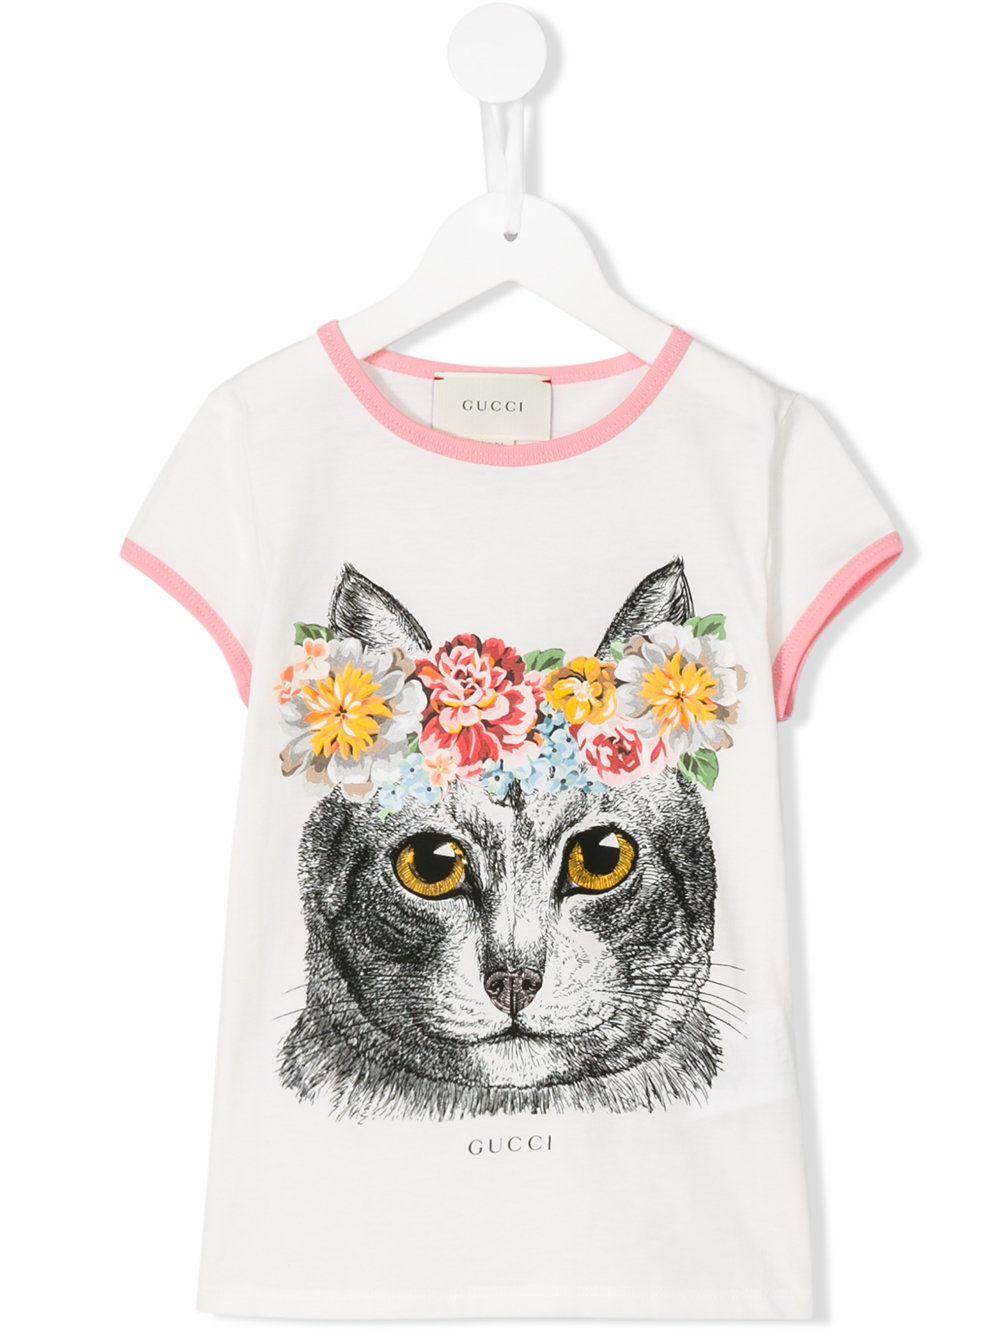 Gucci Kids 고양이 프린트 티셔츠  9333f0545